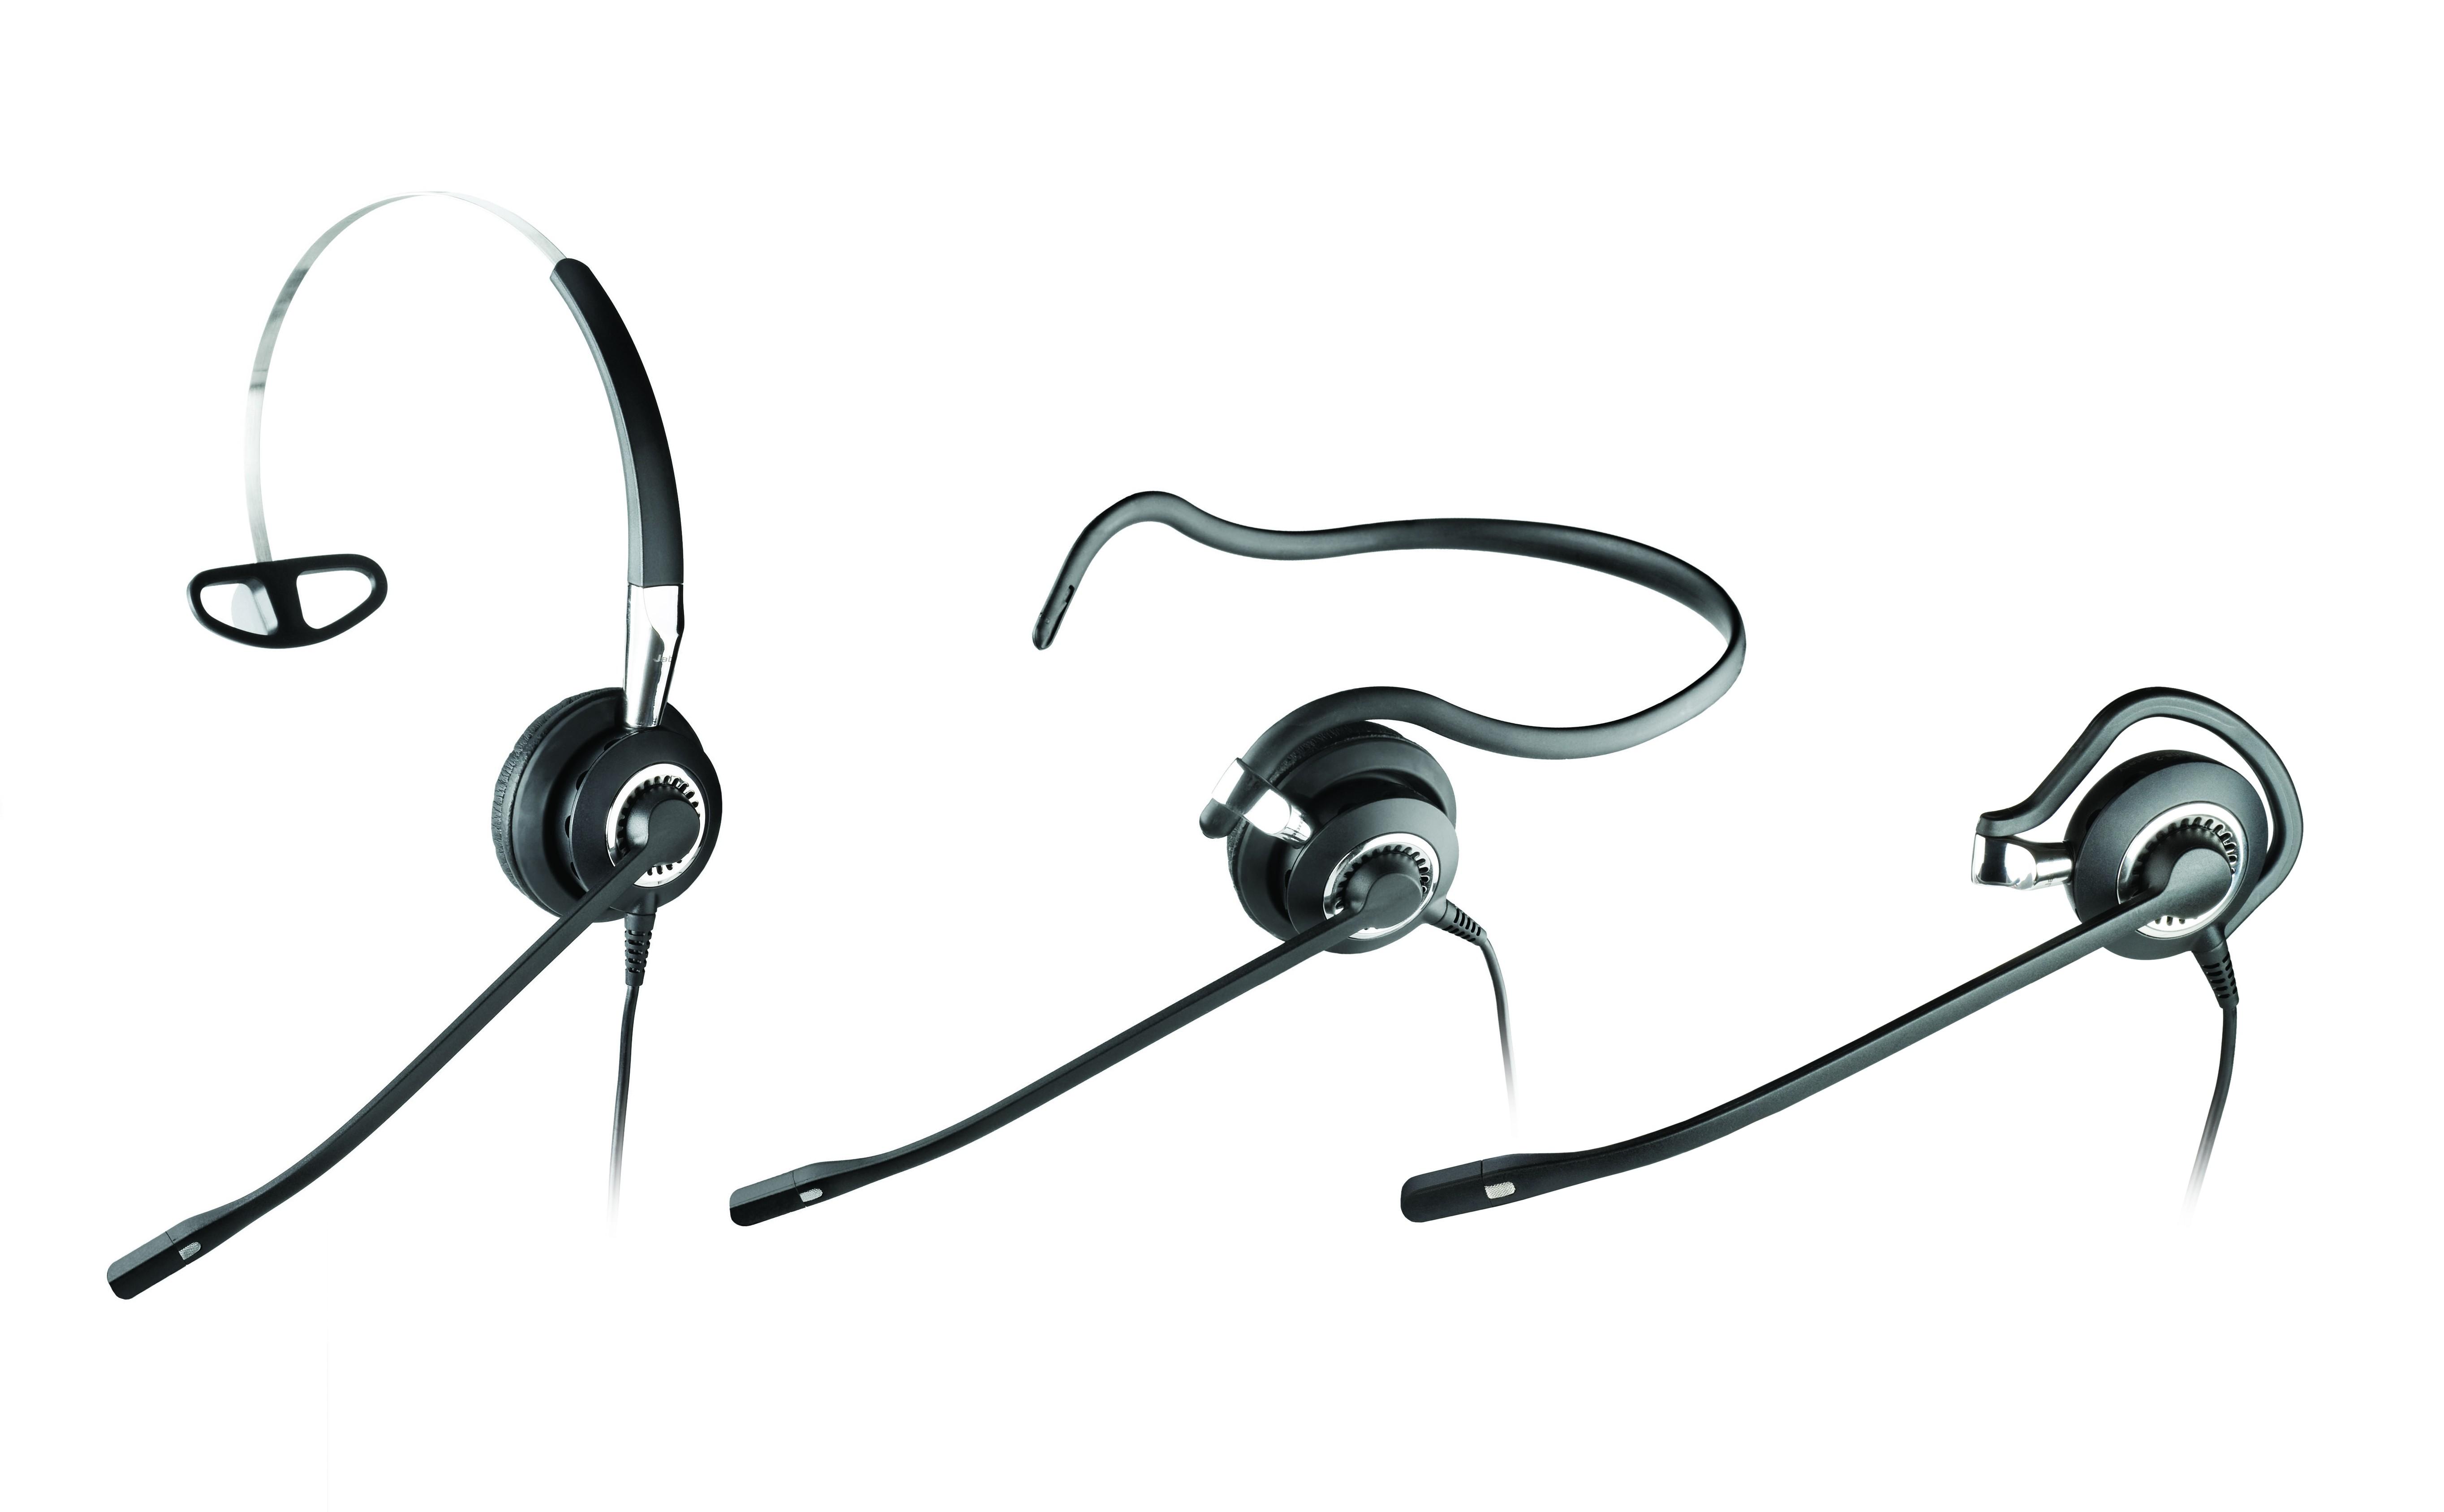 Jabra Biz 2400 II Mono 3-in-1 Noise Cancelling Headset